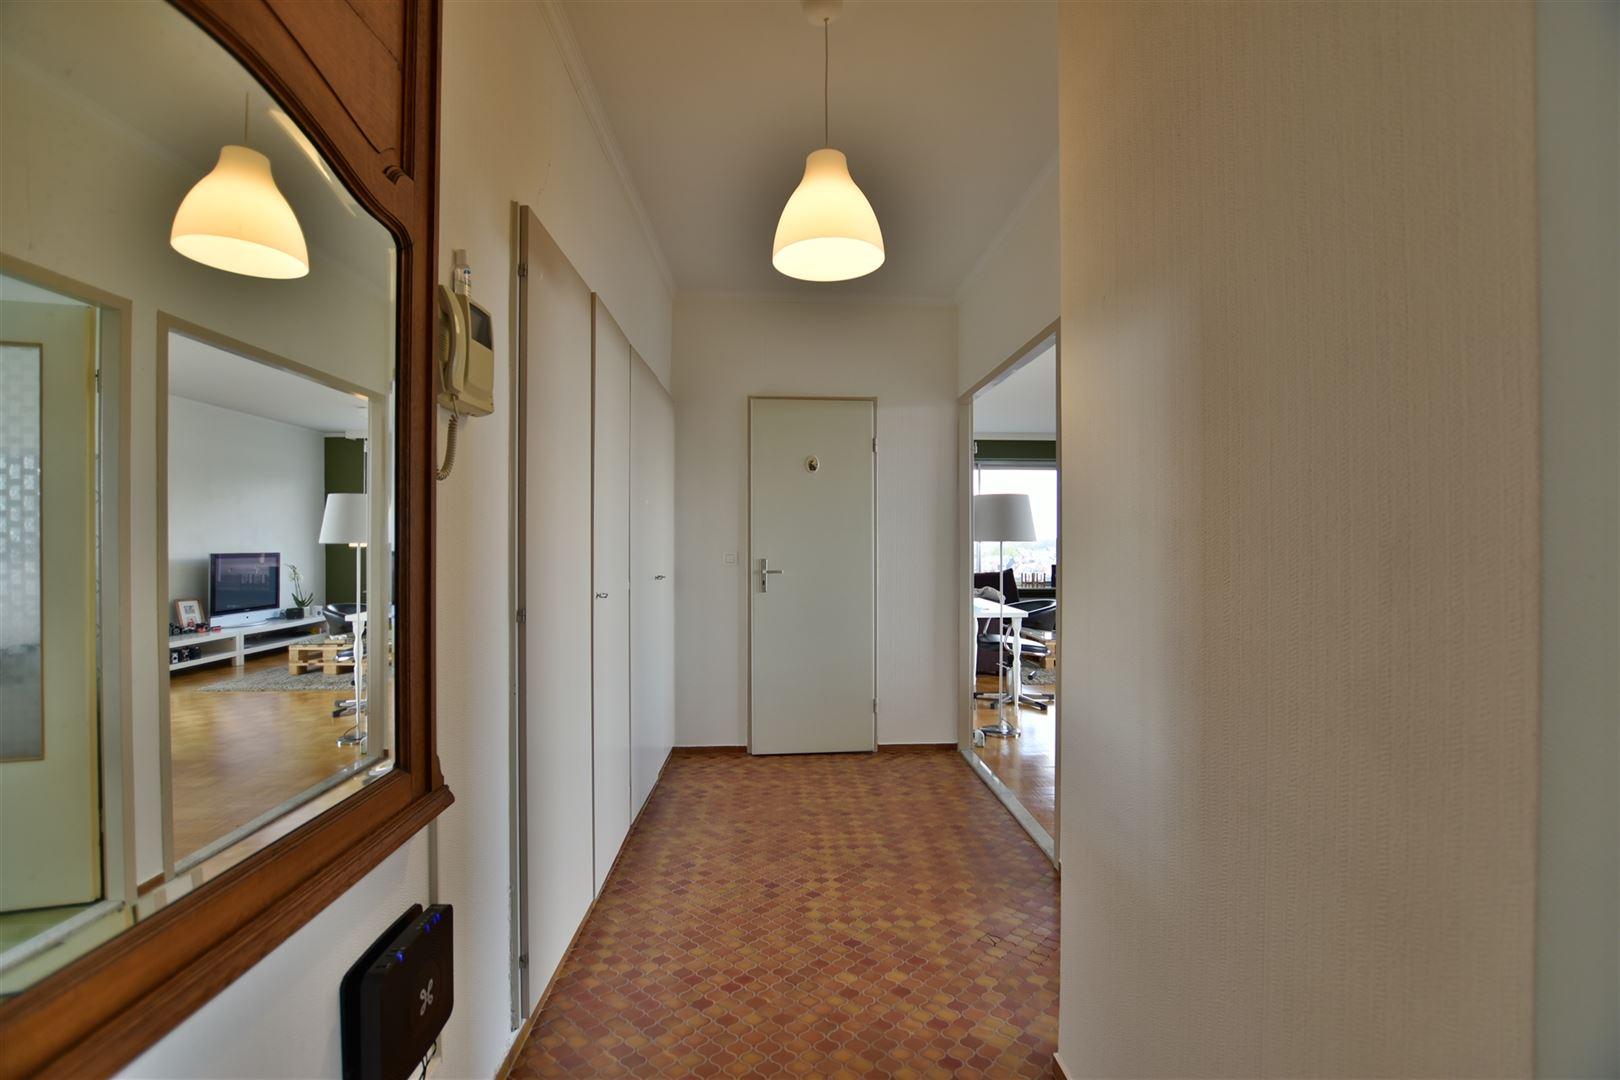 Foto 4 : Appartement te 9200 DENDERMONDE (België) - Prijs € 169.000